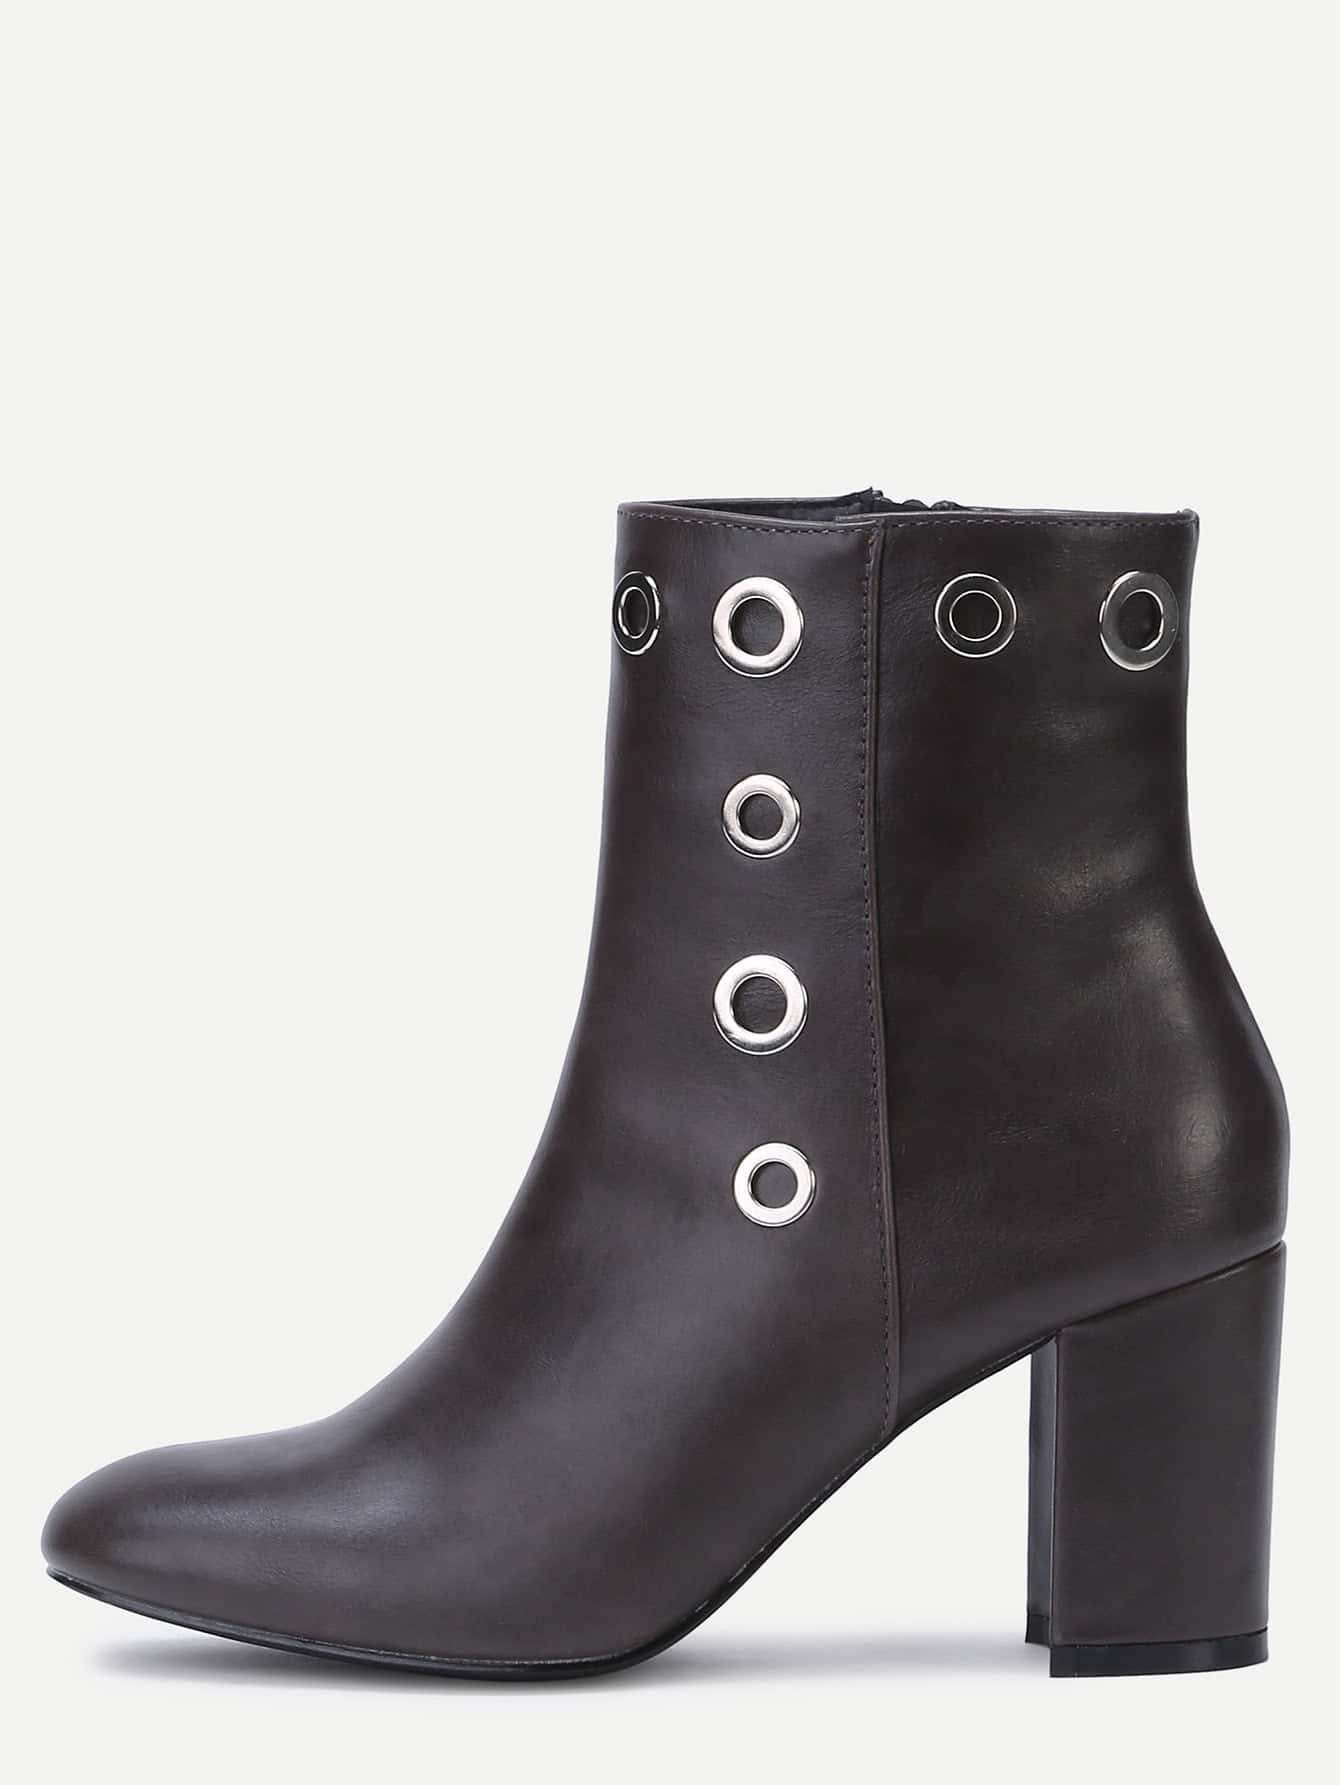 Brown PU Point Toe Chunky BootsBrown PU Point Toe Chunky Boots<br><br>color: Brown<br>size: EUR39